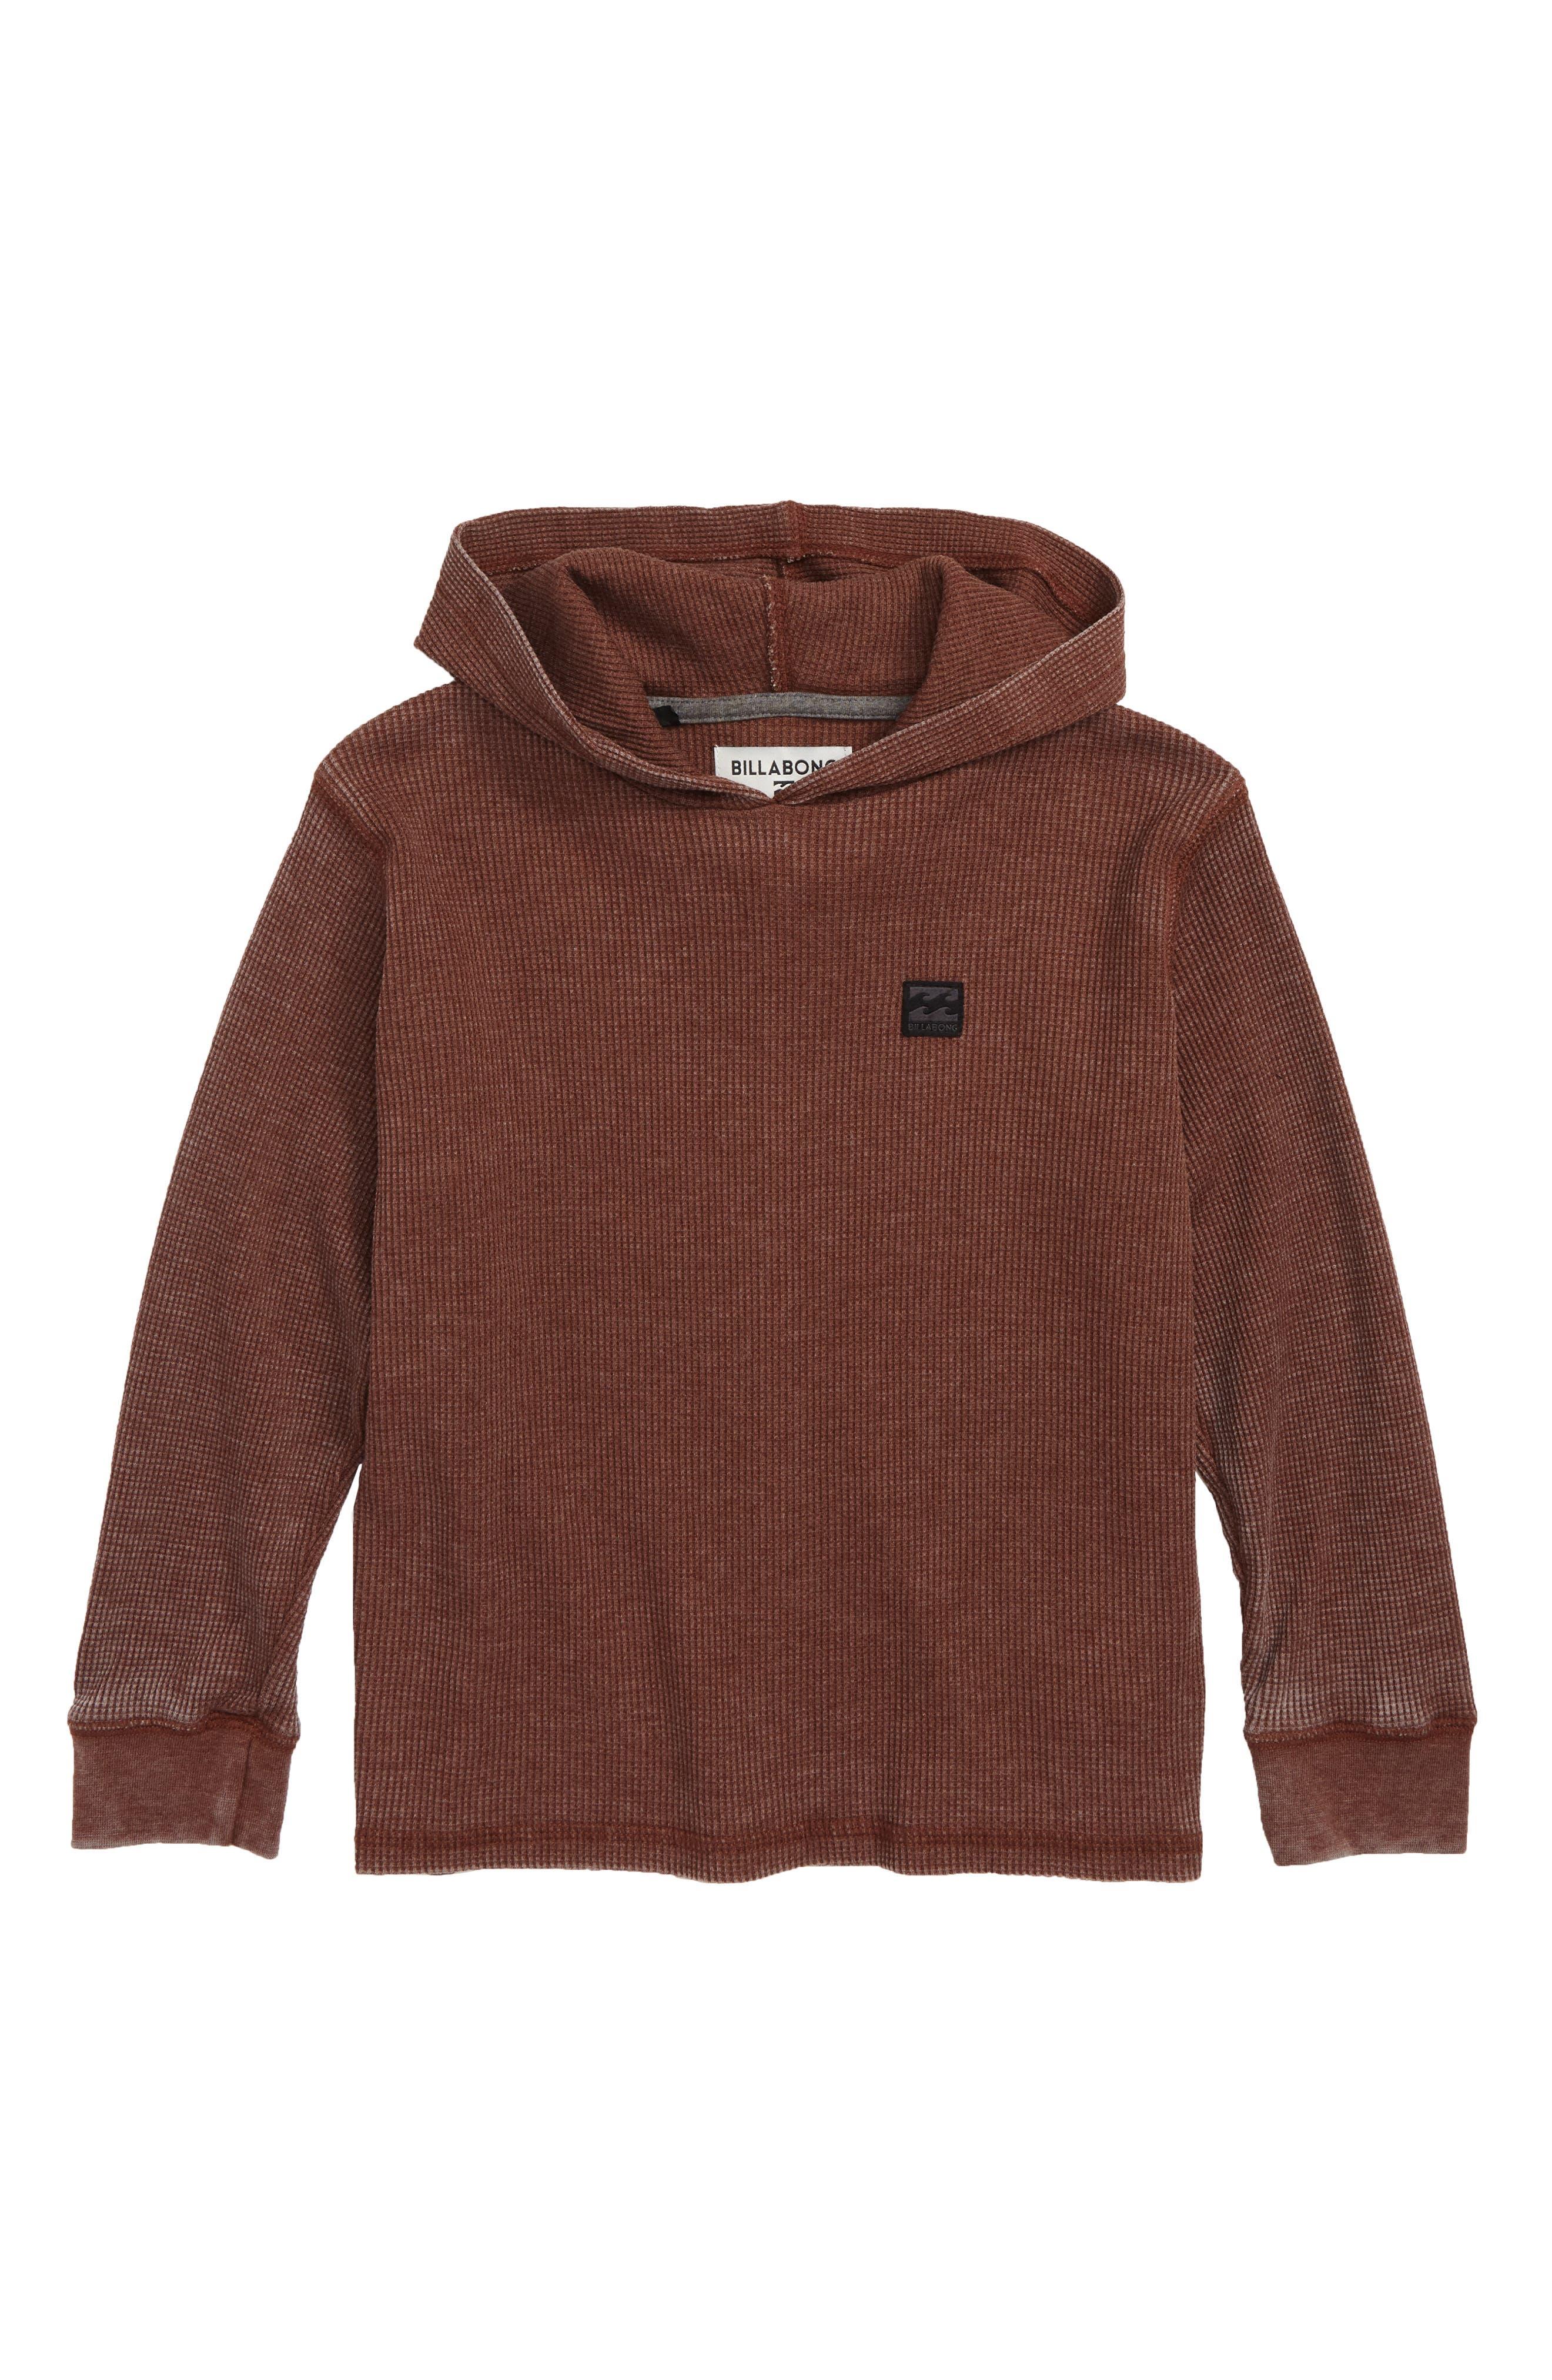 Keystone Thermal Pullover Hoodie,                             Main thumbnail 1, color,                             Rust Brown